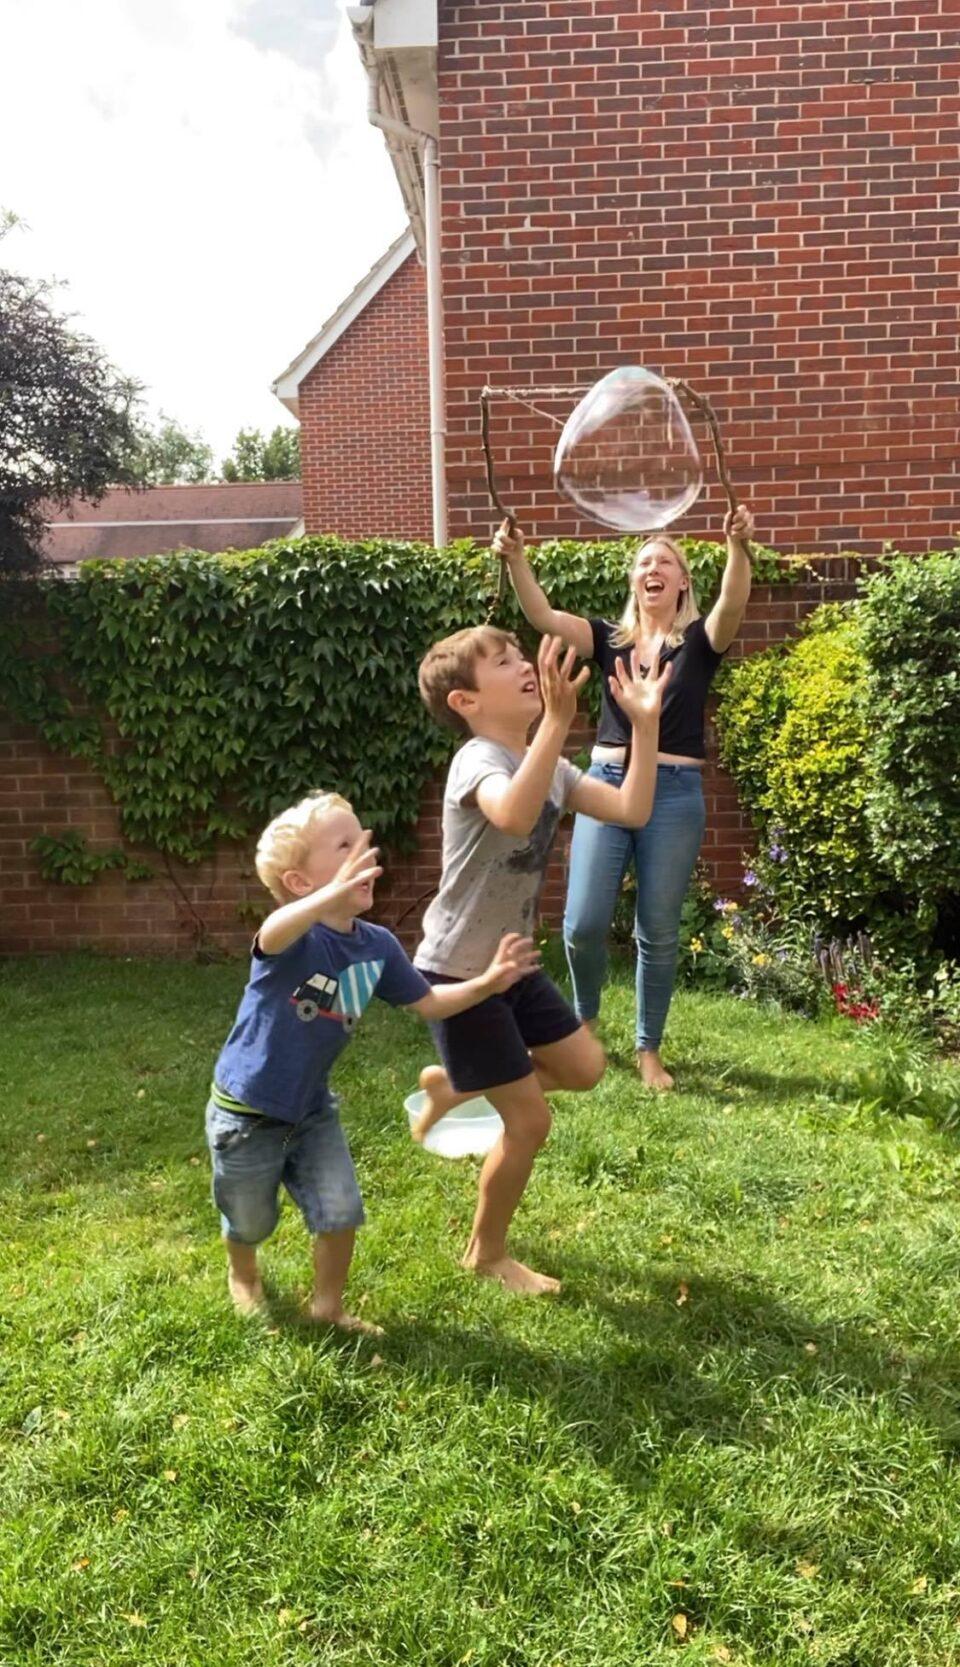 boys chasing bubbles